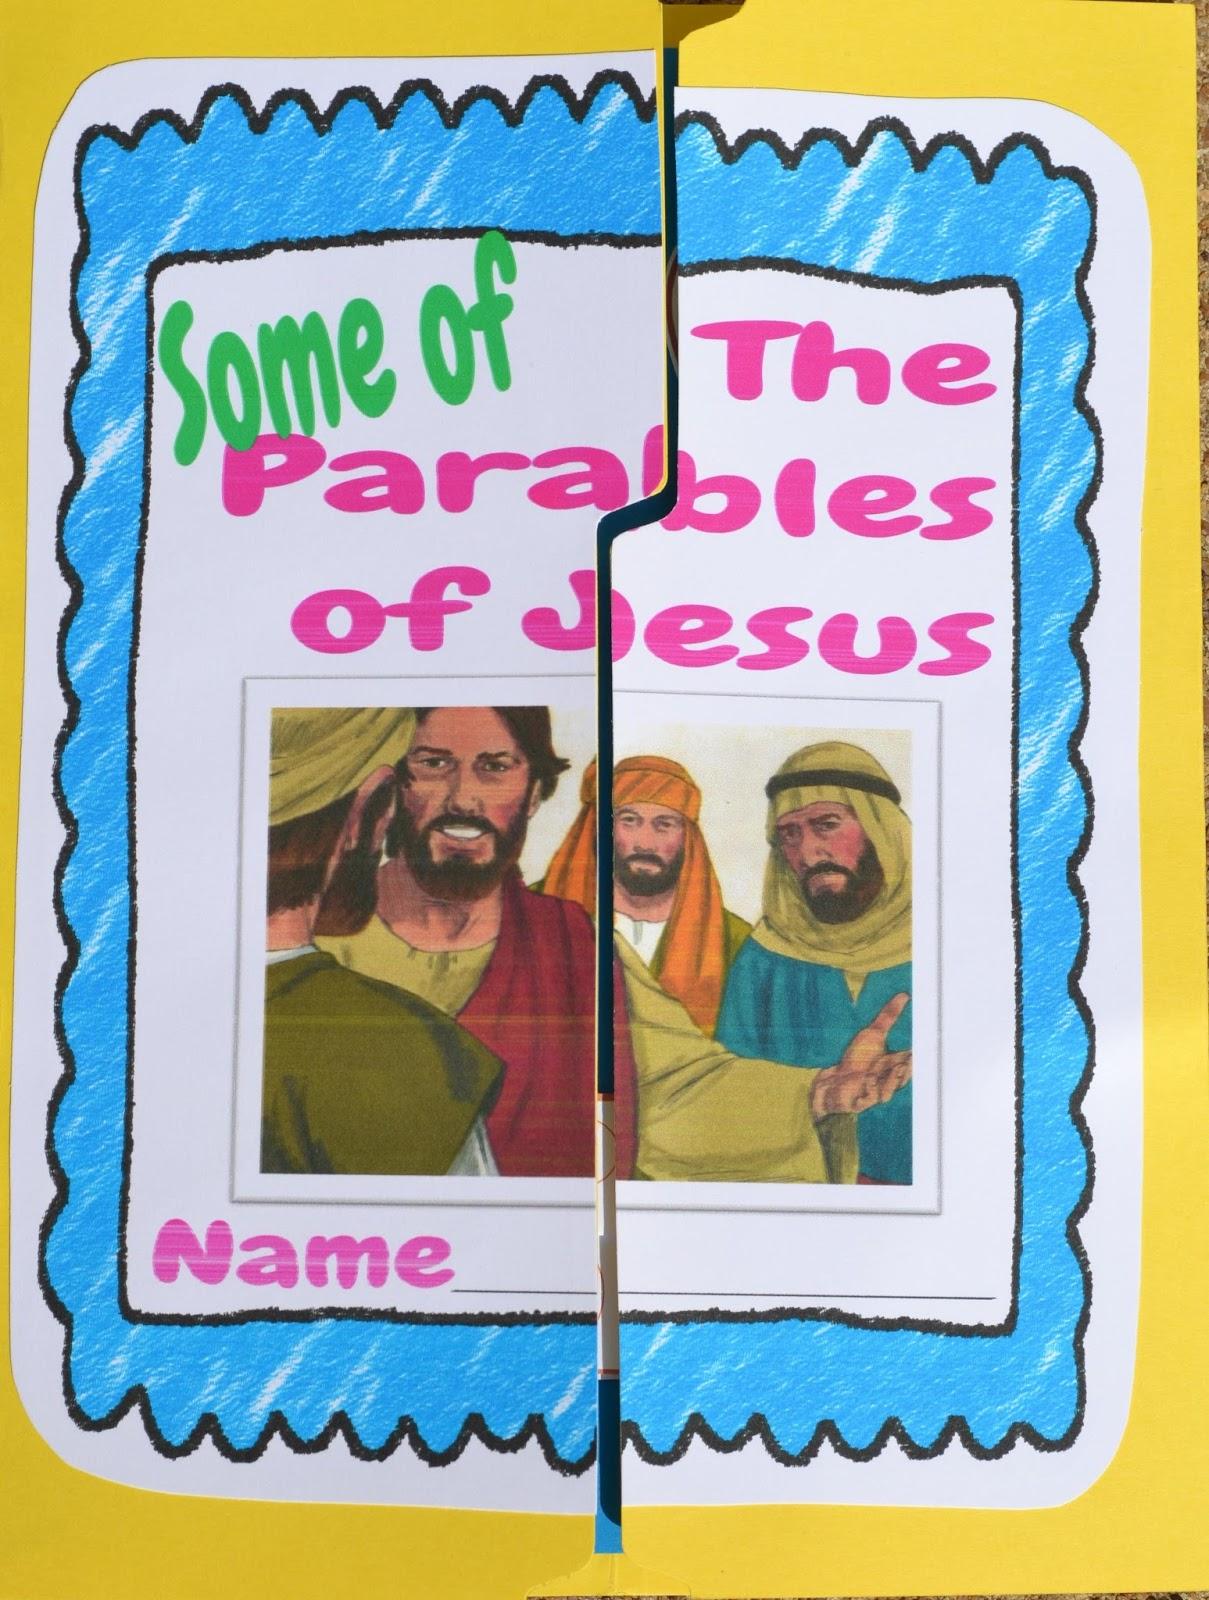 http://kidsbibledebjackson.blogspot.com/2014/09/parables-of-jesus-lapbook.html